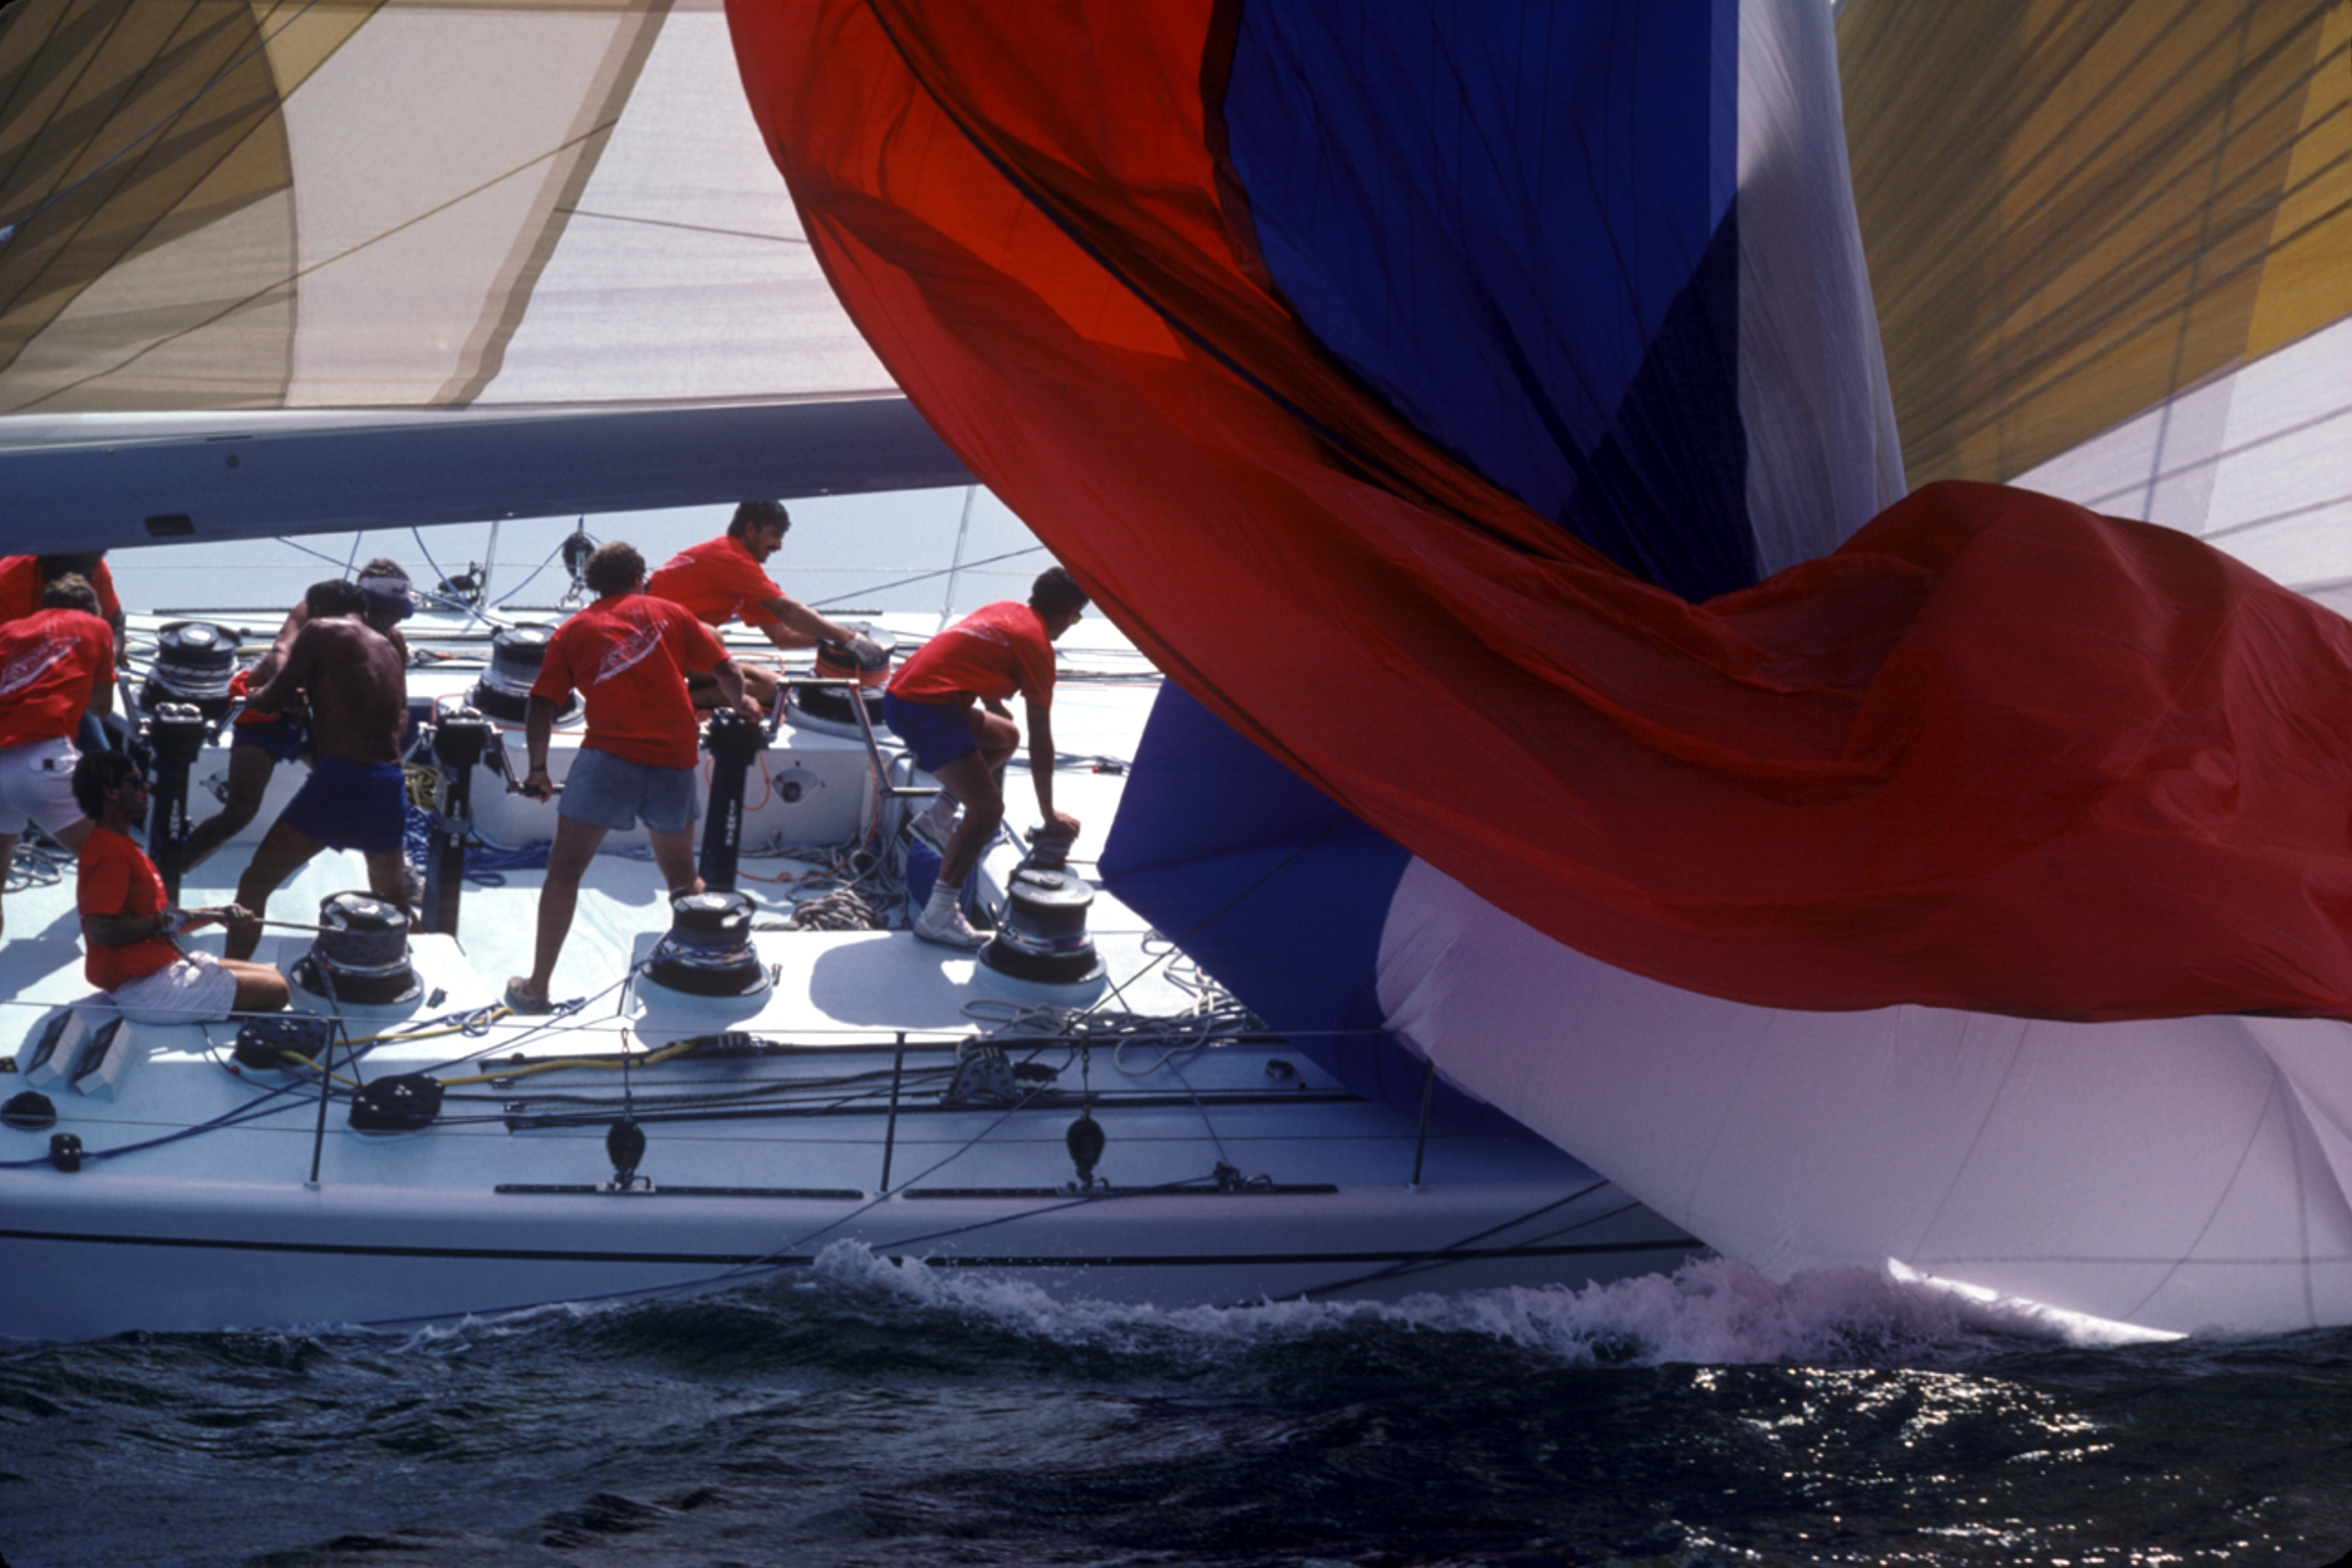 Kialoa 5 racing